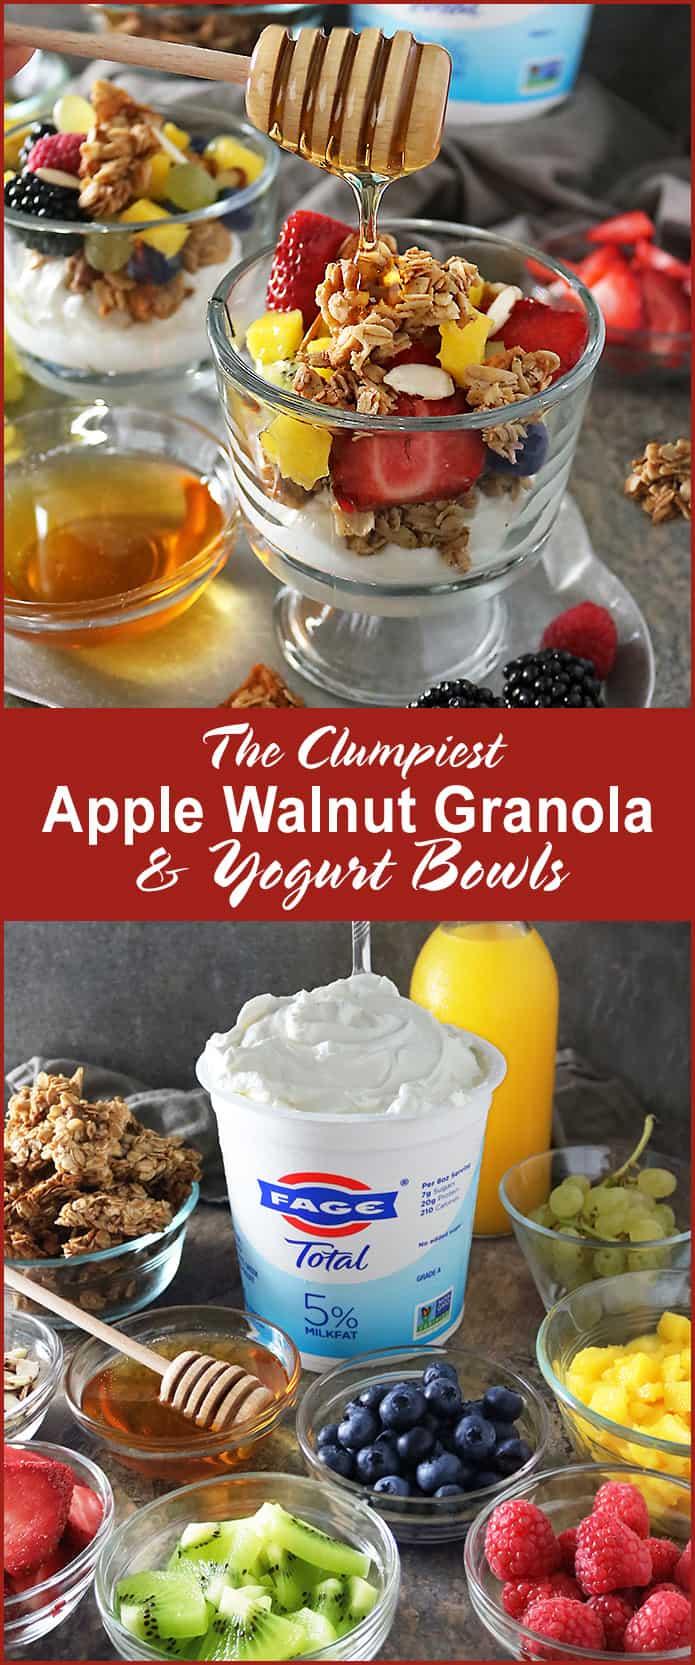 Clumpiest Apple walnut Granola And Fage Greek Yogurt Bowls #ad #FAGEYourWay @FAGE